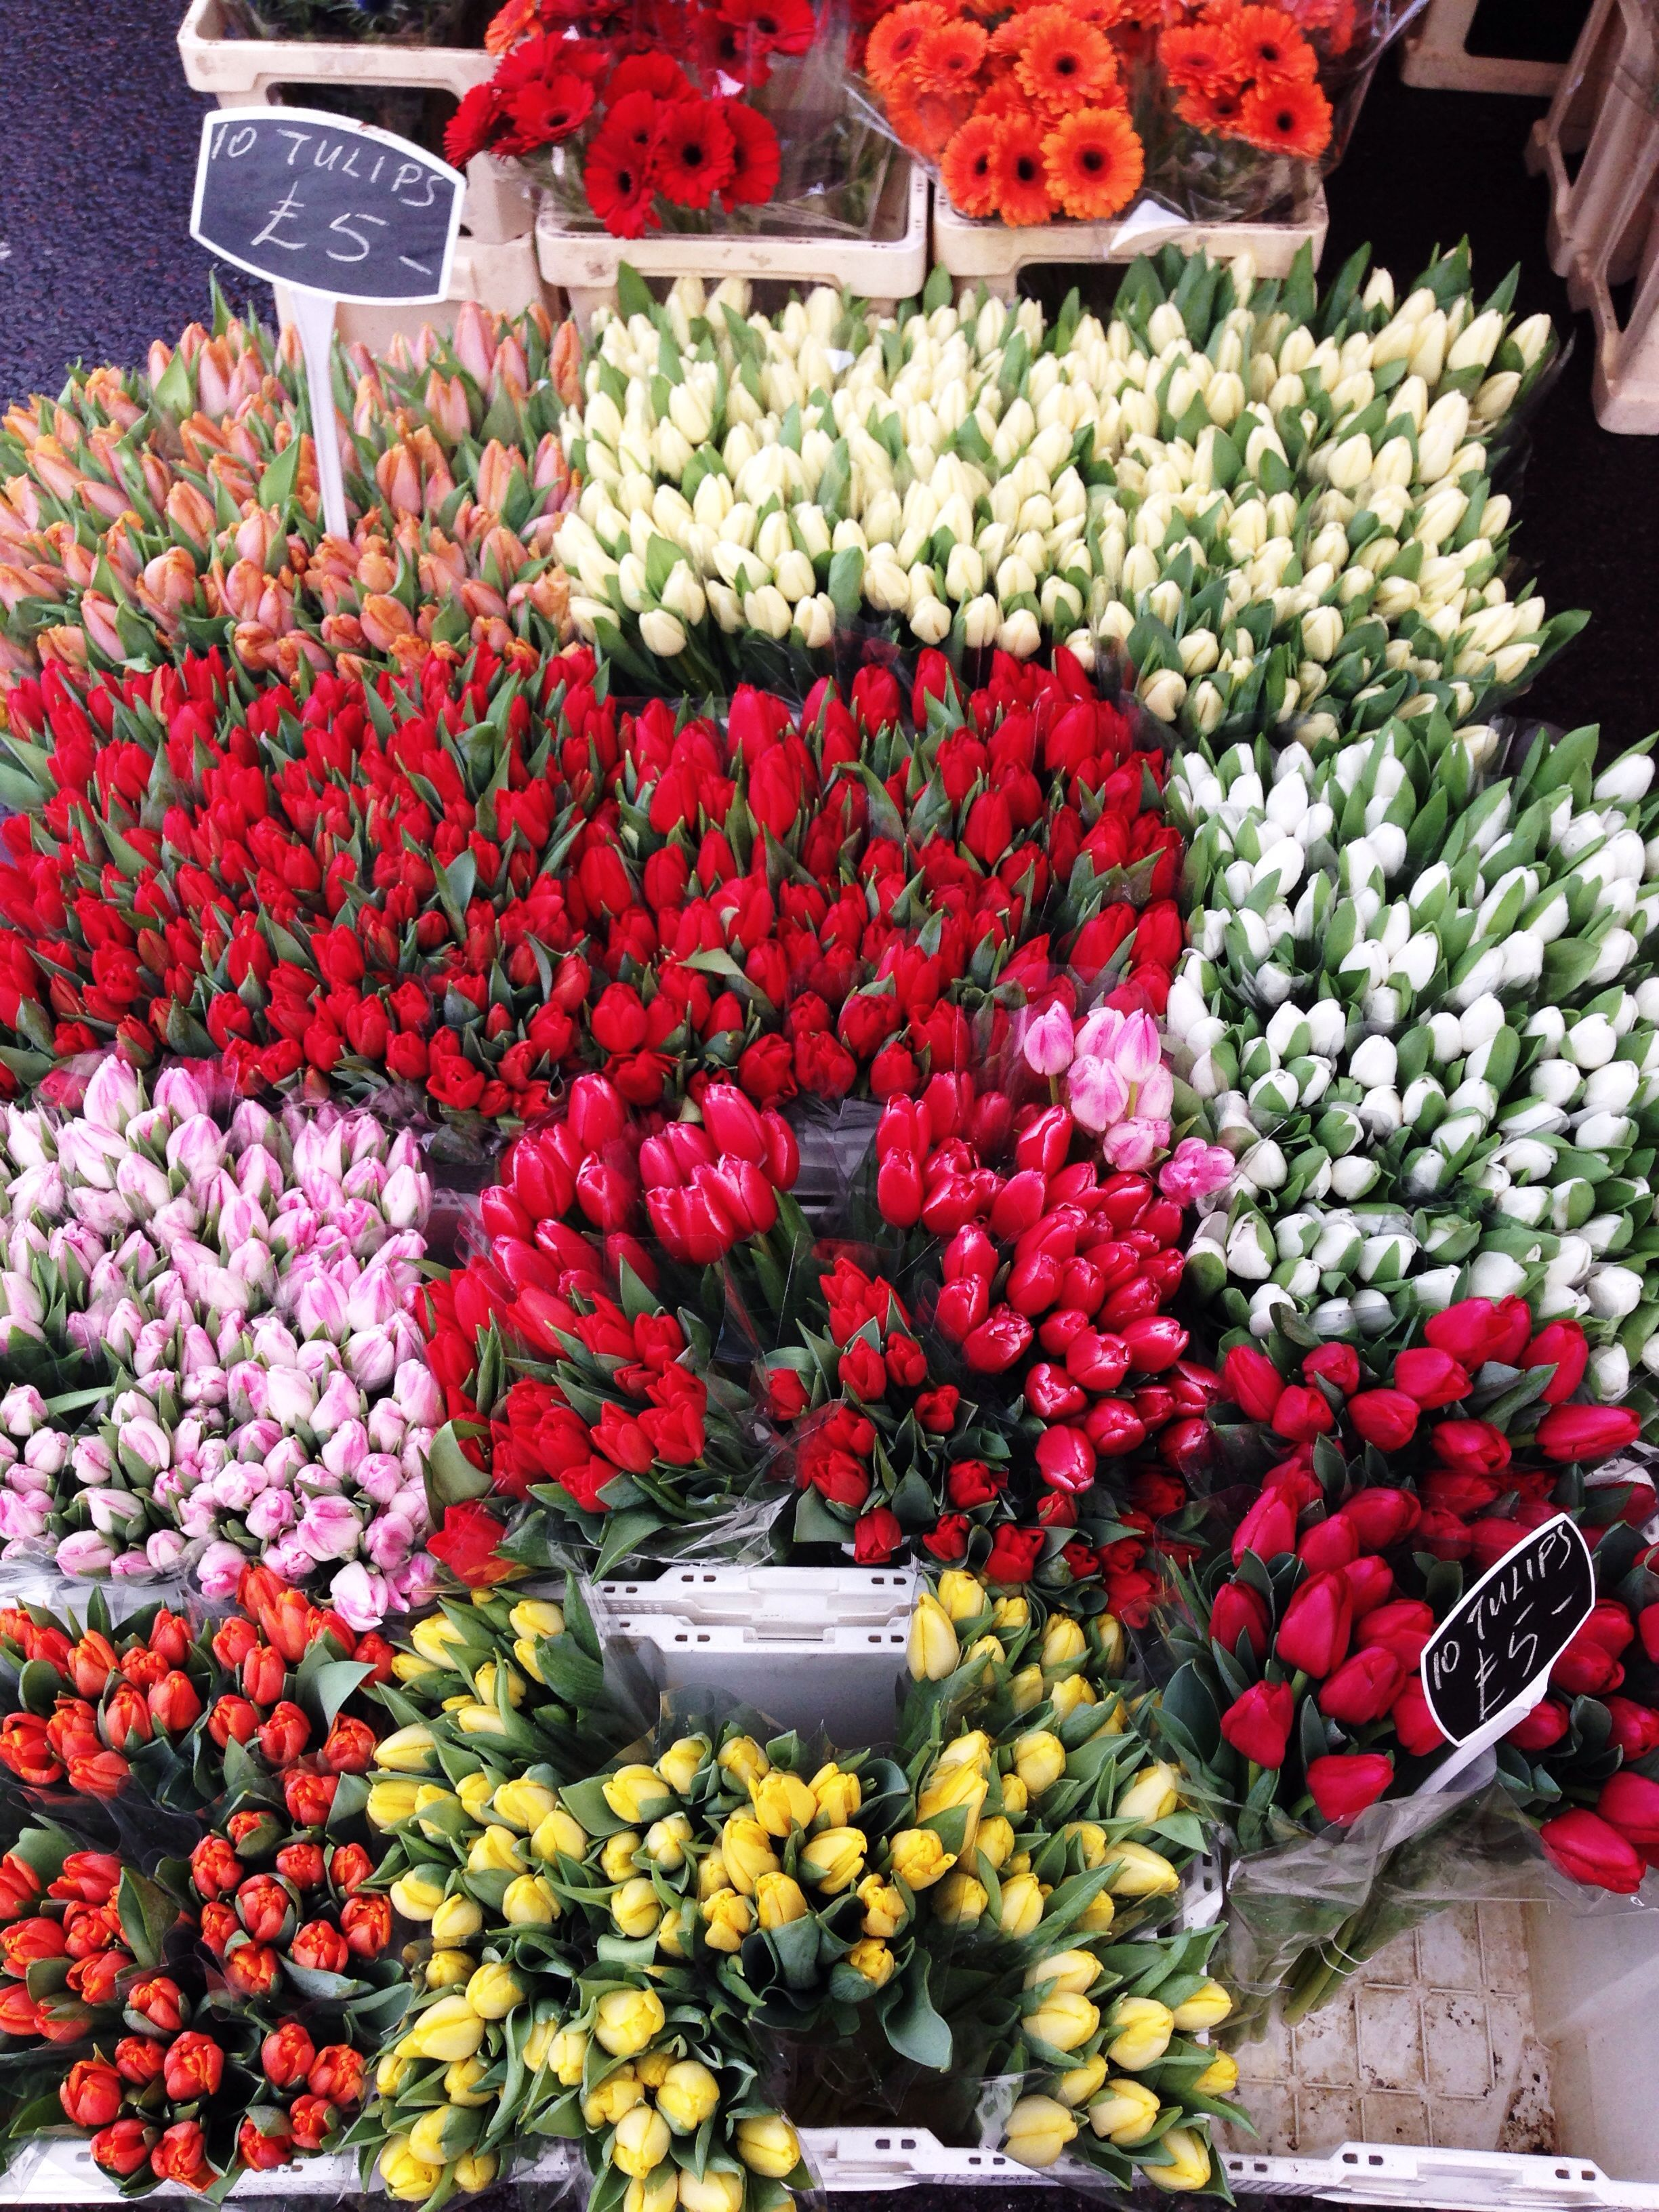 Shoreditch Market: Broadway Market, Shoreditch/ London (2014